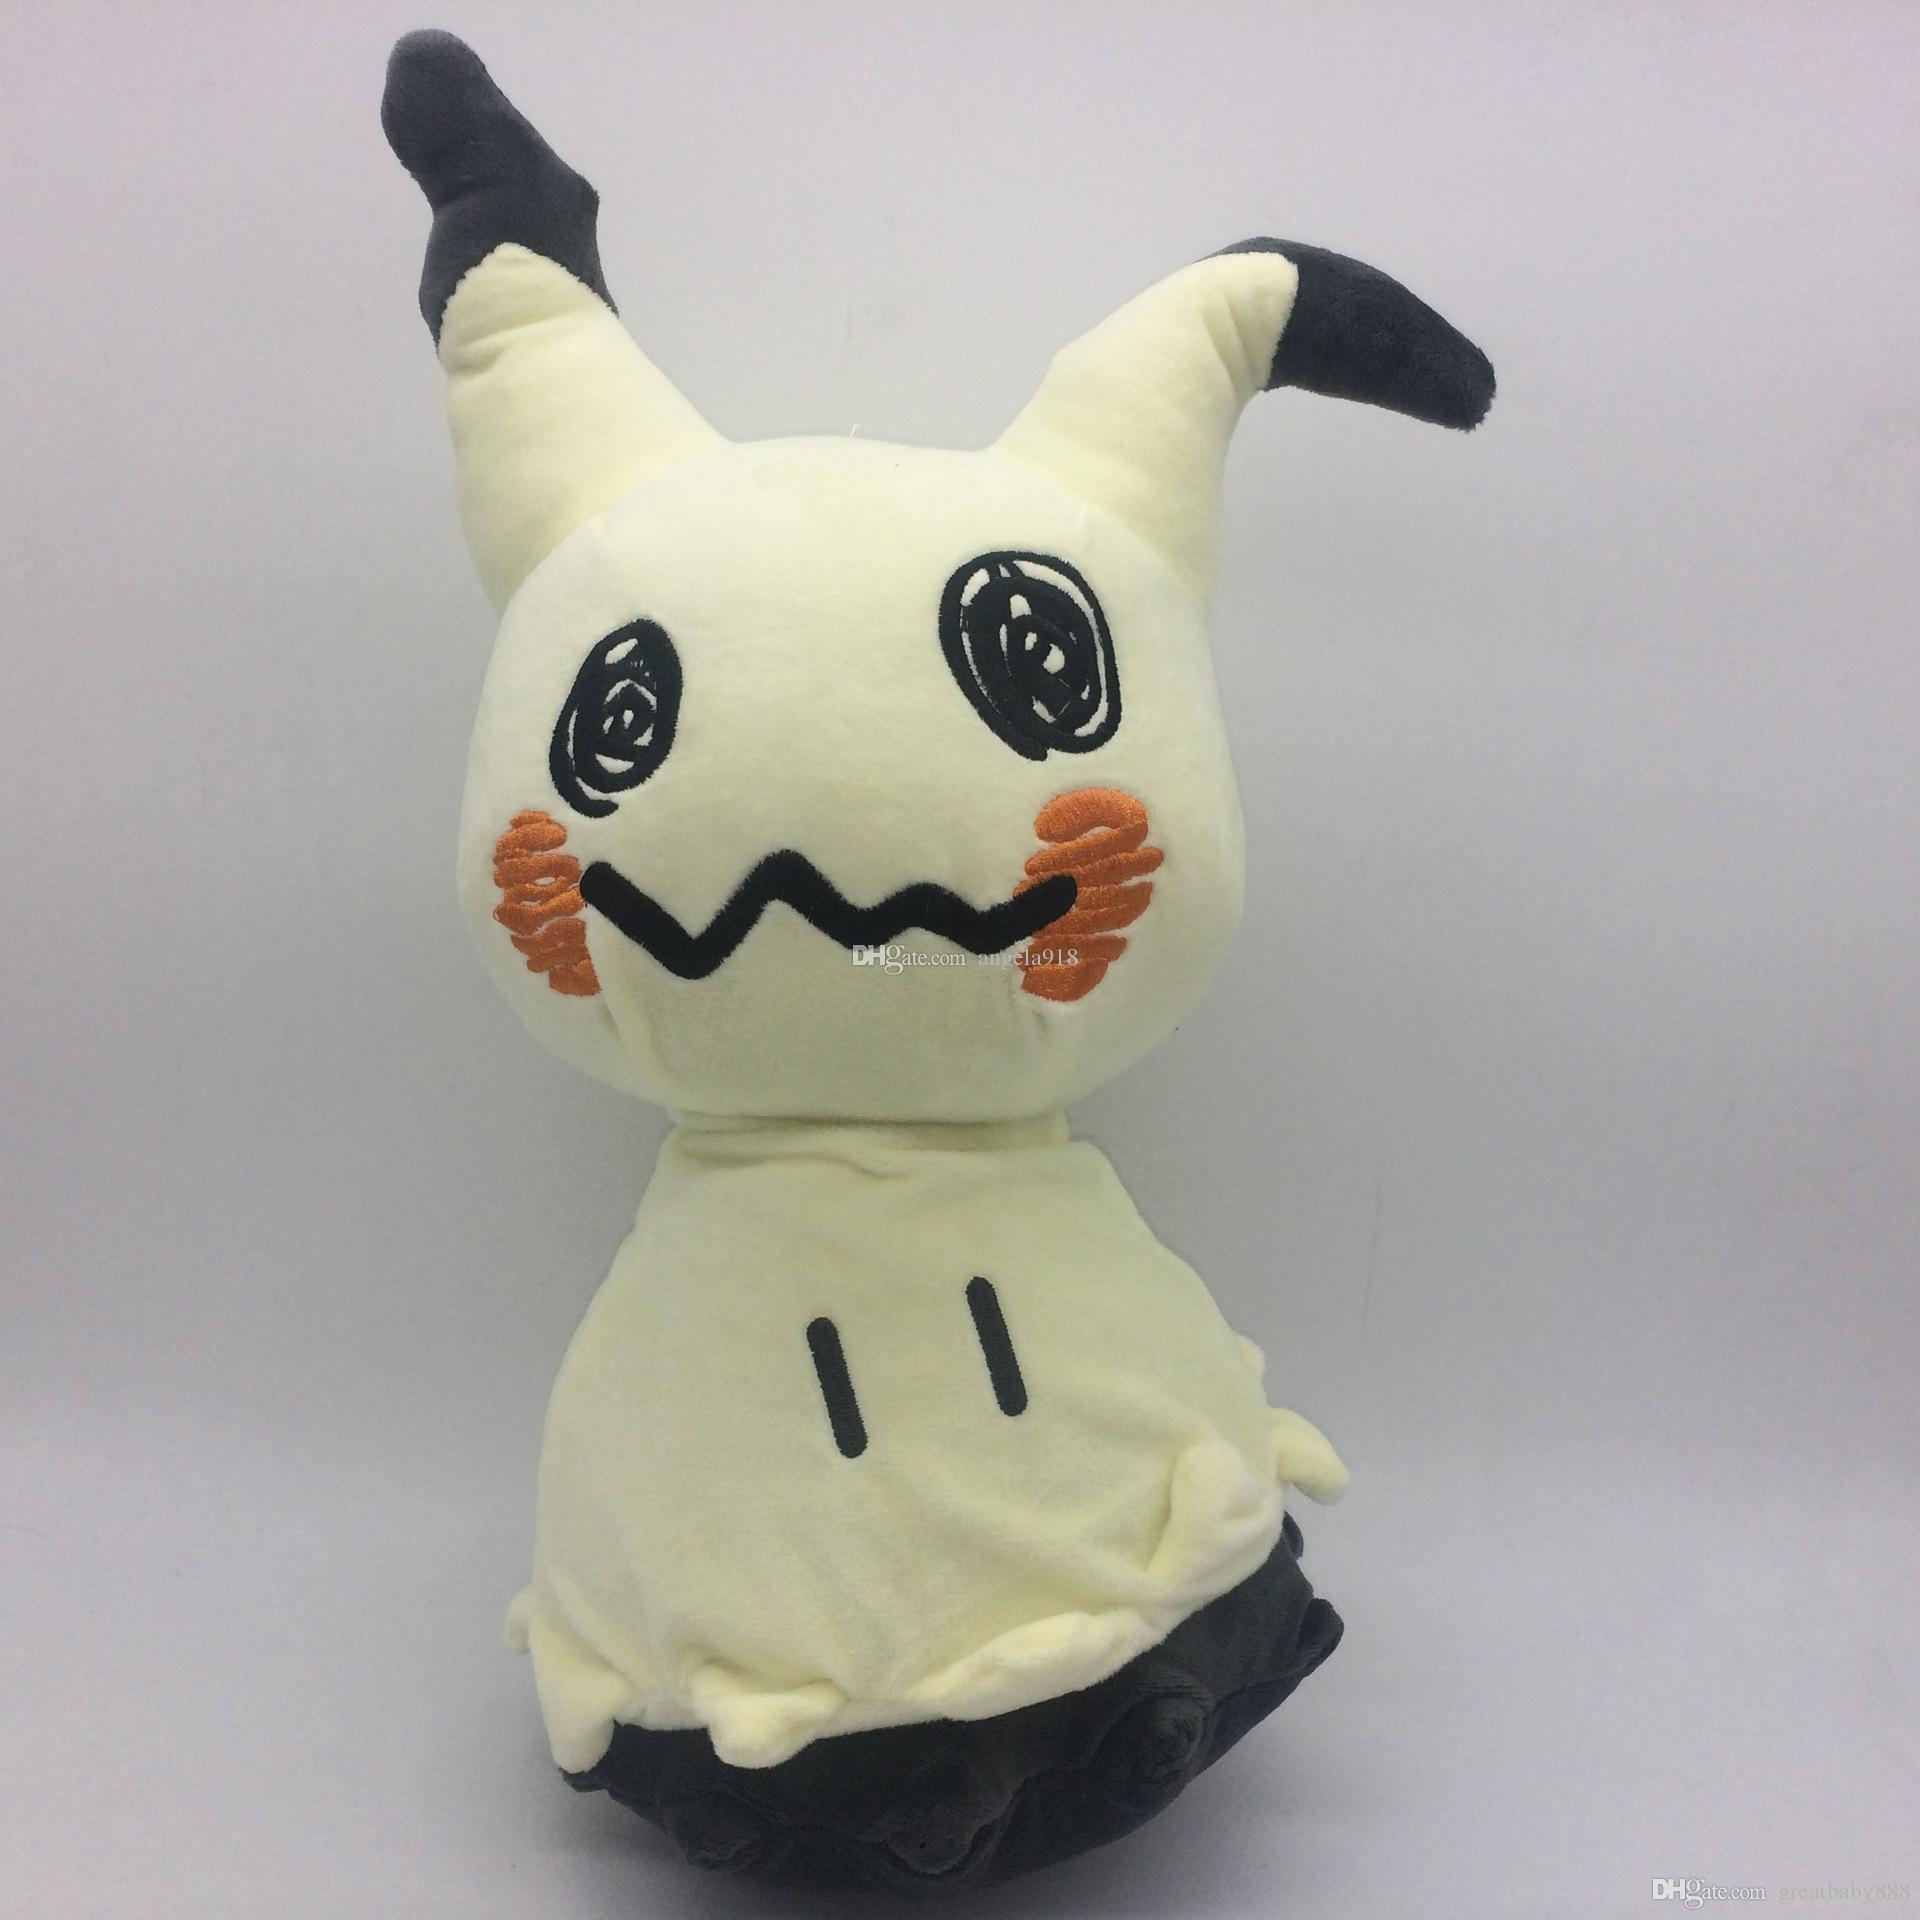 2017 New Poke Plush Toys Q Version Pikachu Stuffed Animals Baby Doll  30cm/12 Inches C2014 Poke Plush Toys Pikachu Plush Toys Pikachu Stuffed  Animals Online ...